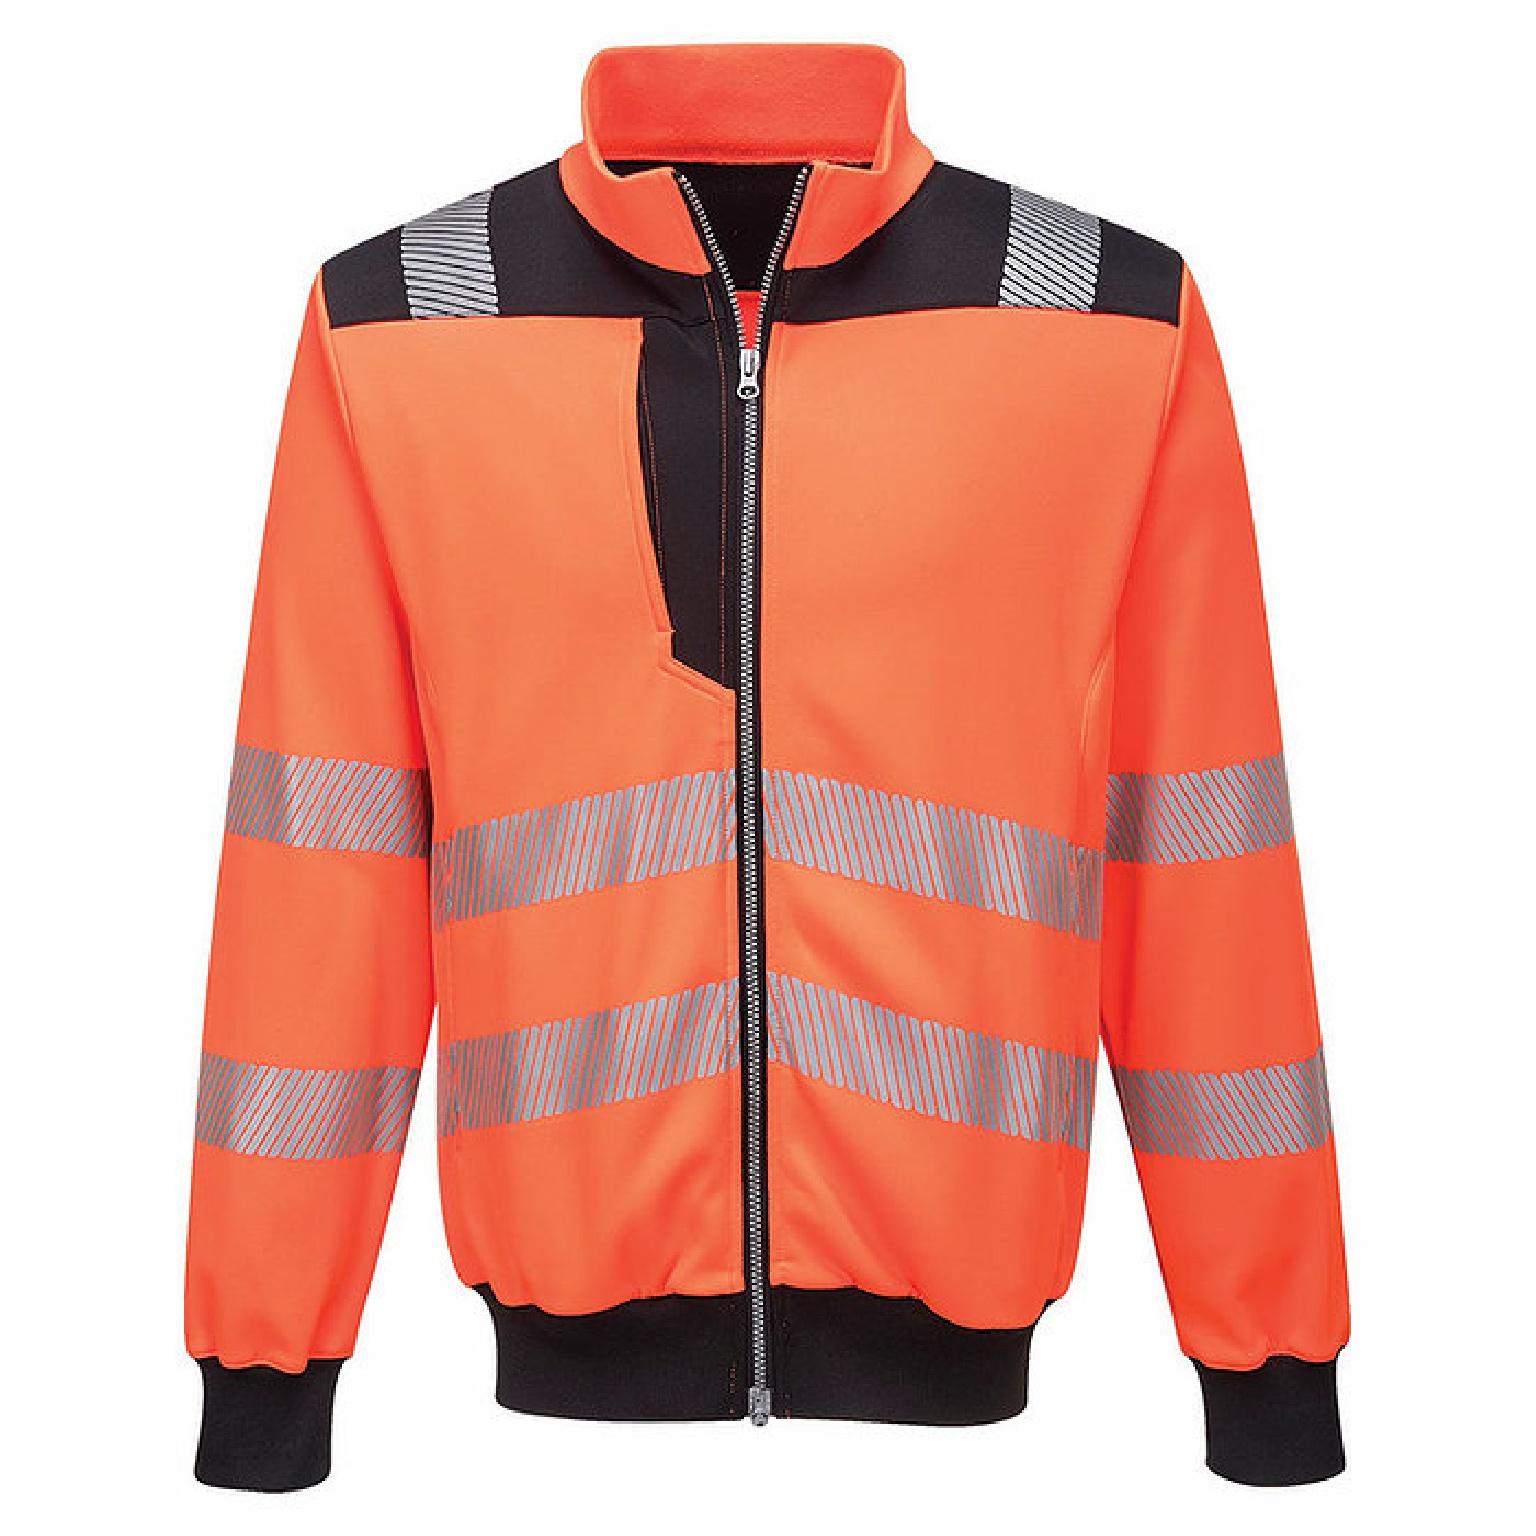 Redrok Workwear Centre Plymouth - Portwest - PW3 Hi-Vis Sweatshirt